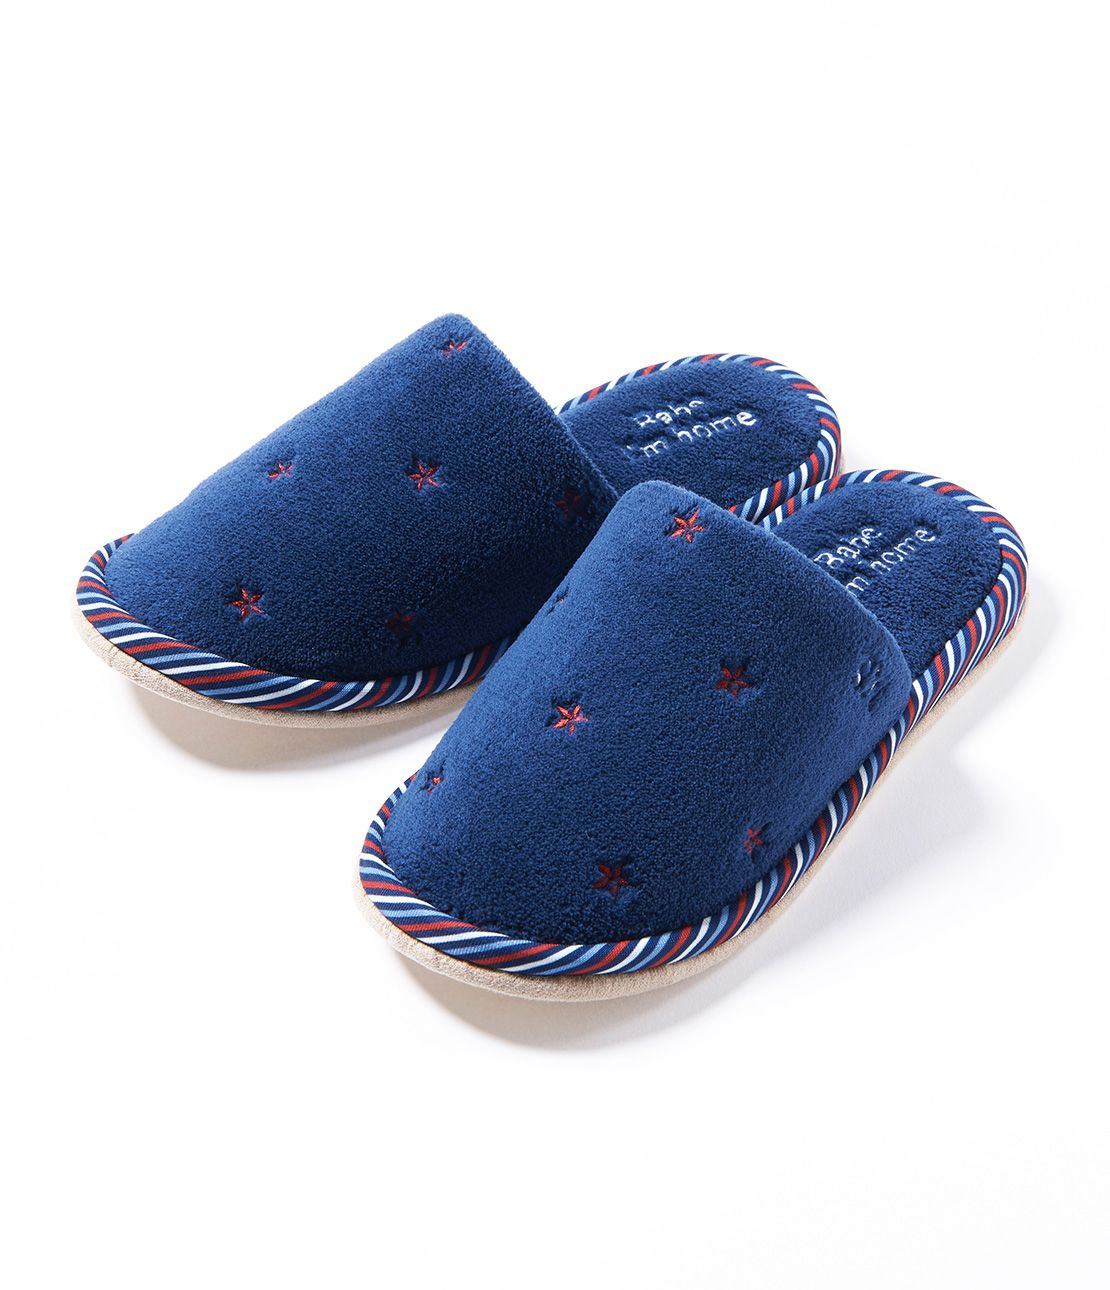 Happy Lovers pair slippers set